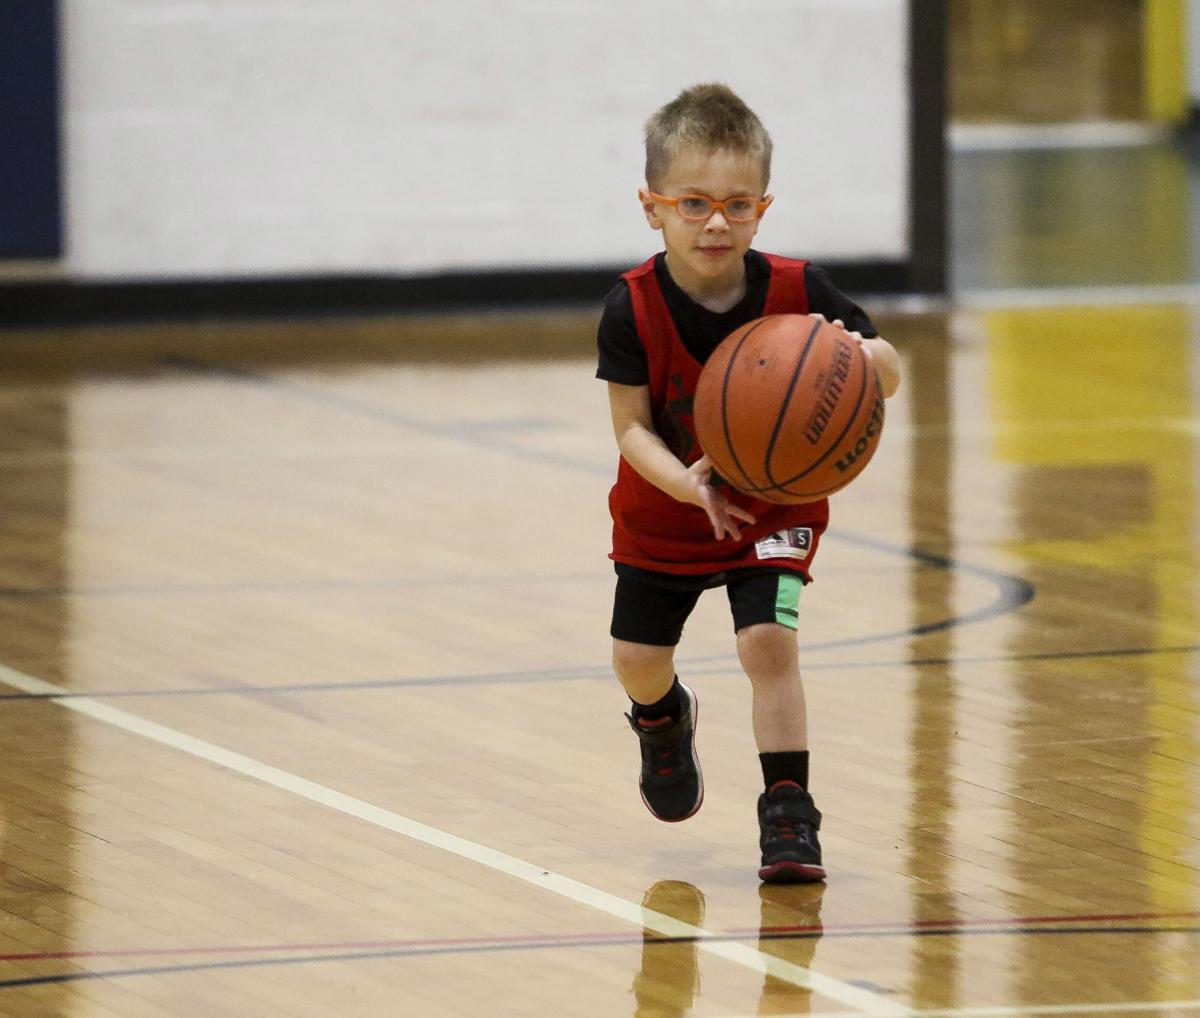 2018 1223 youth basketball04.jpg